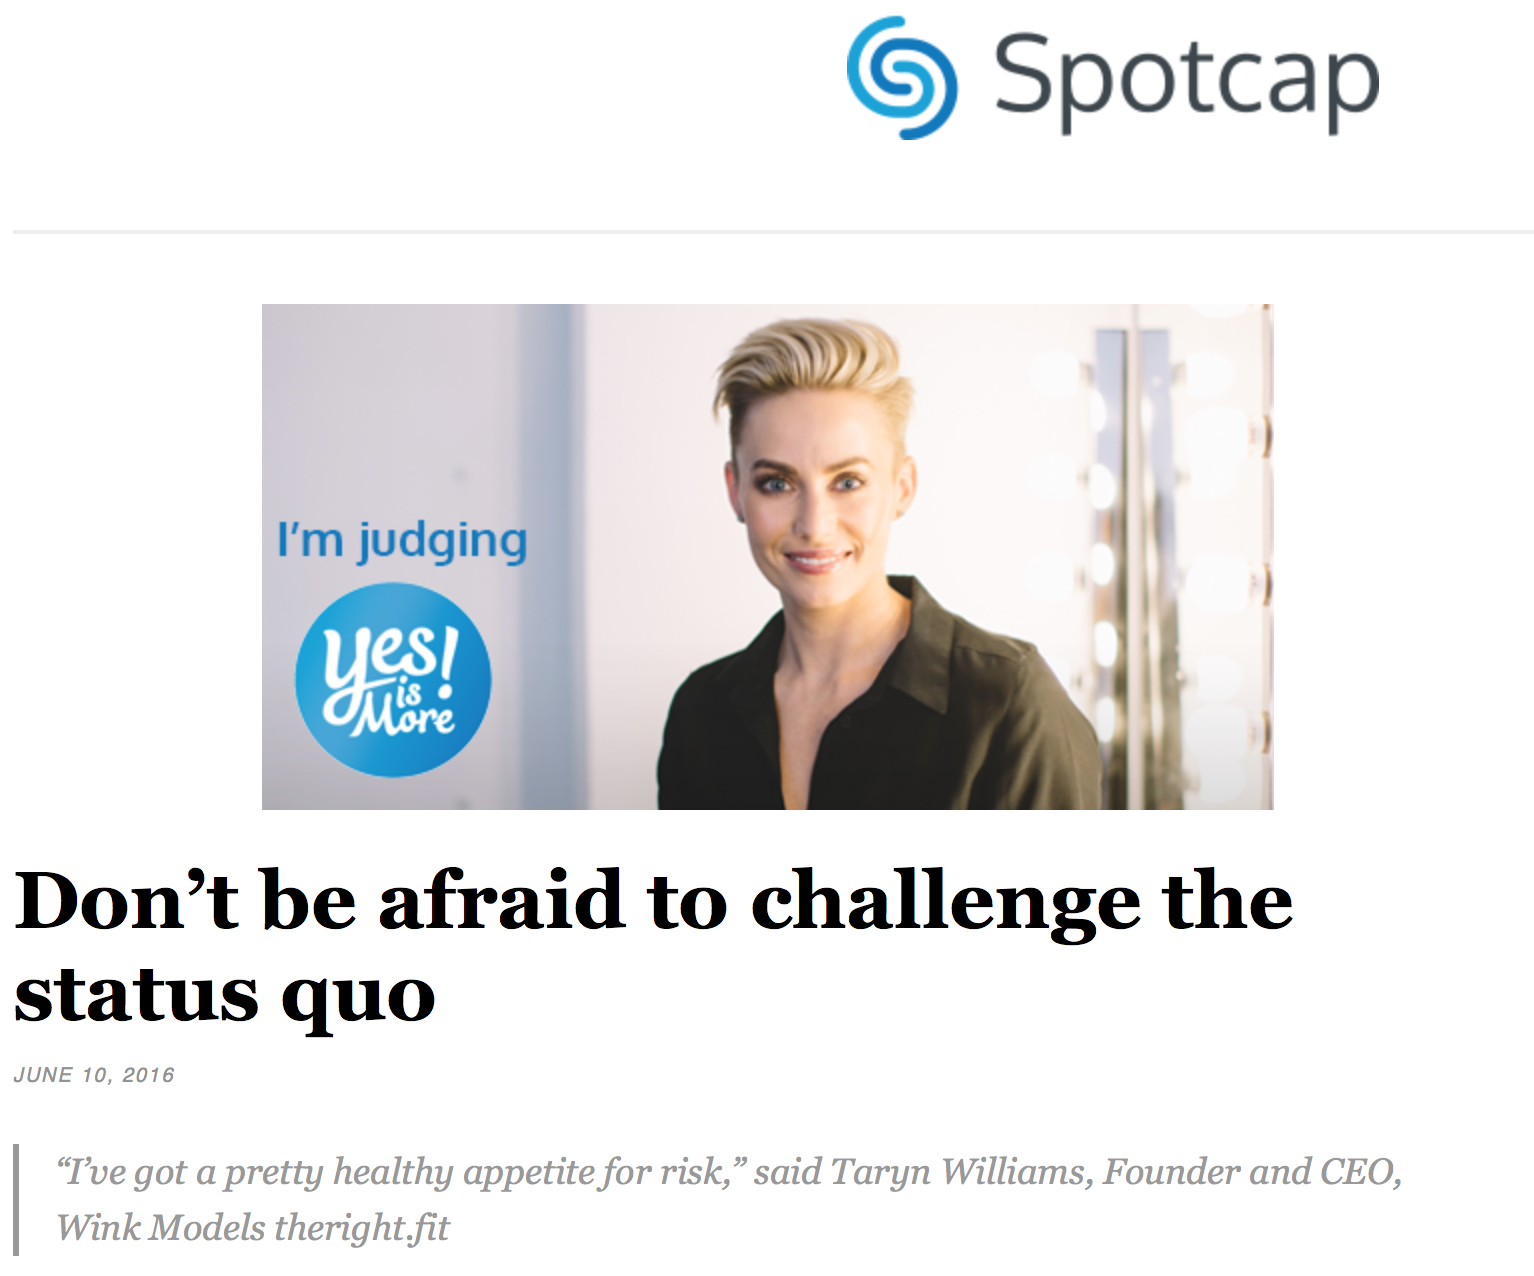 https://www.spotcap.com.au/blog/dont-be-afraid-to-challenge-the-status-quo